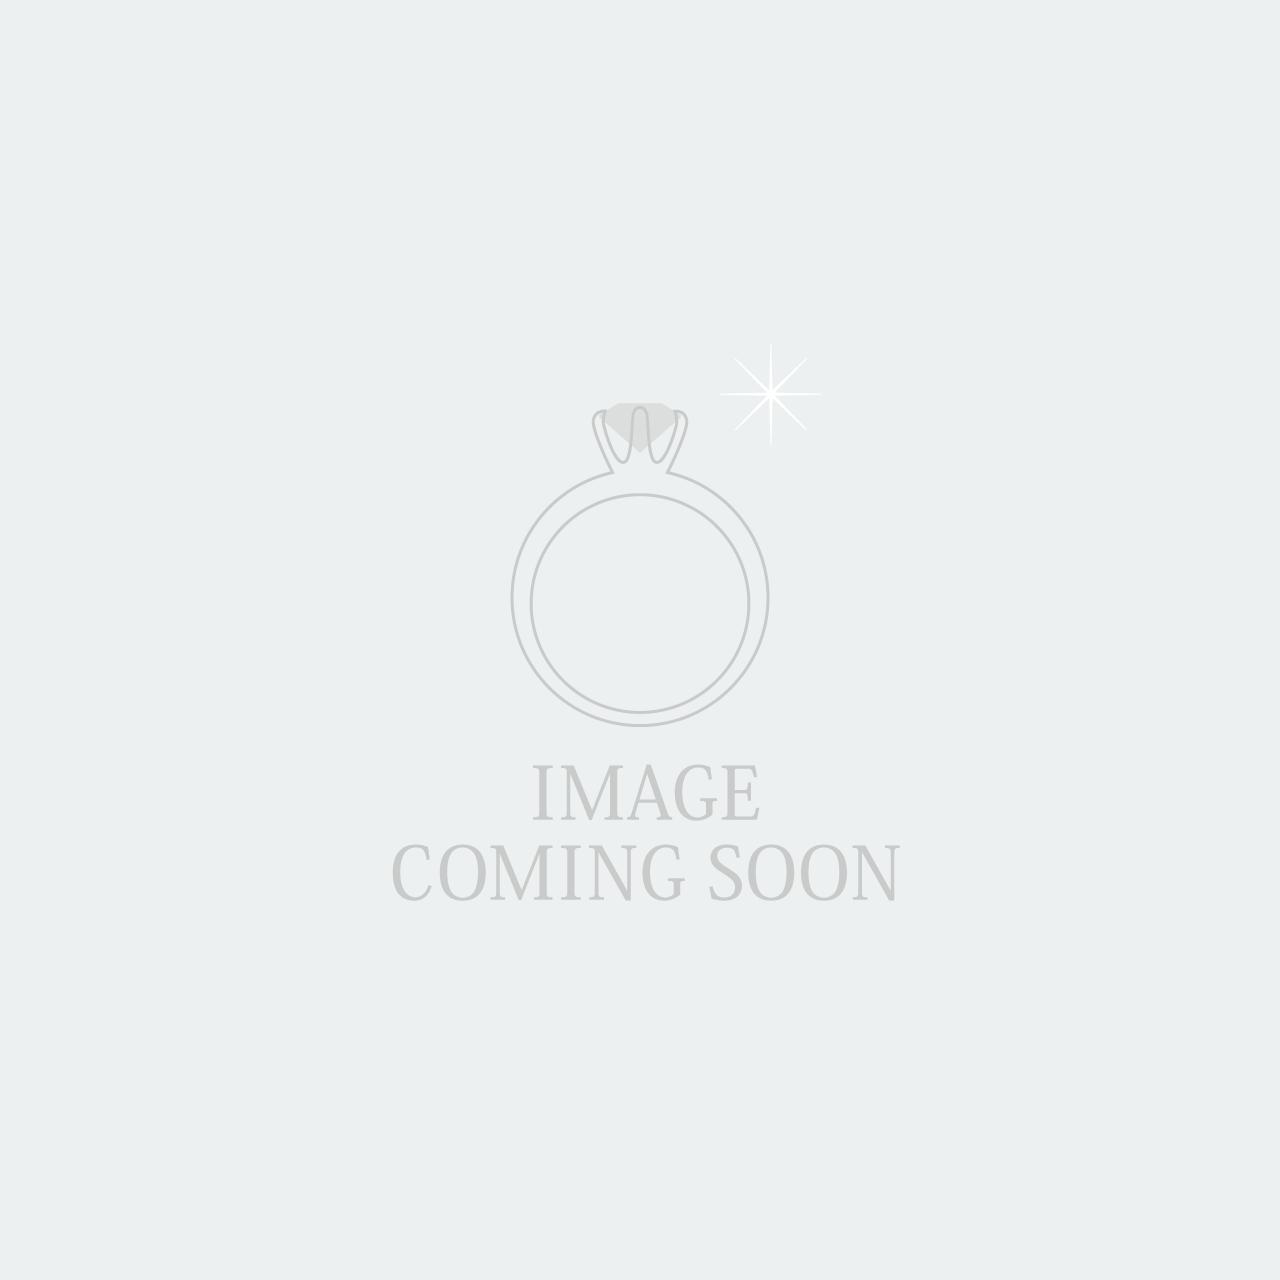 UV硬化樹脂 / 3Dモデル (ピアス) / リピートロングポストピアス